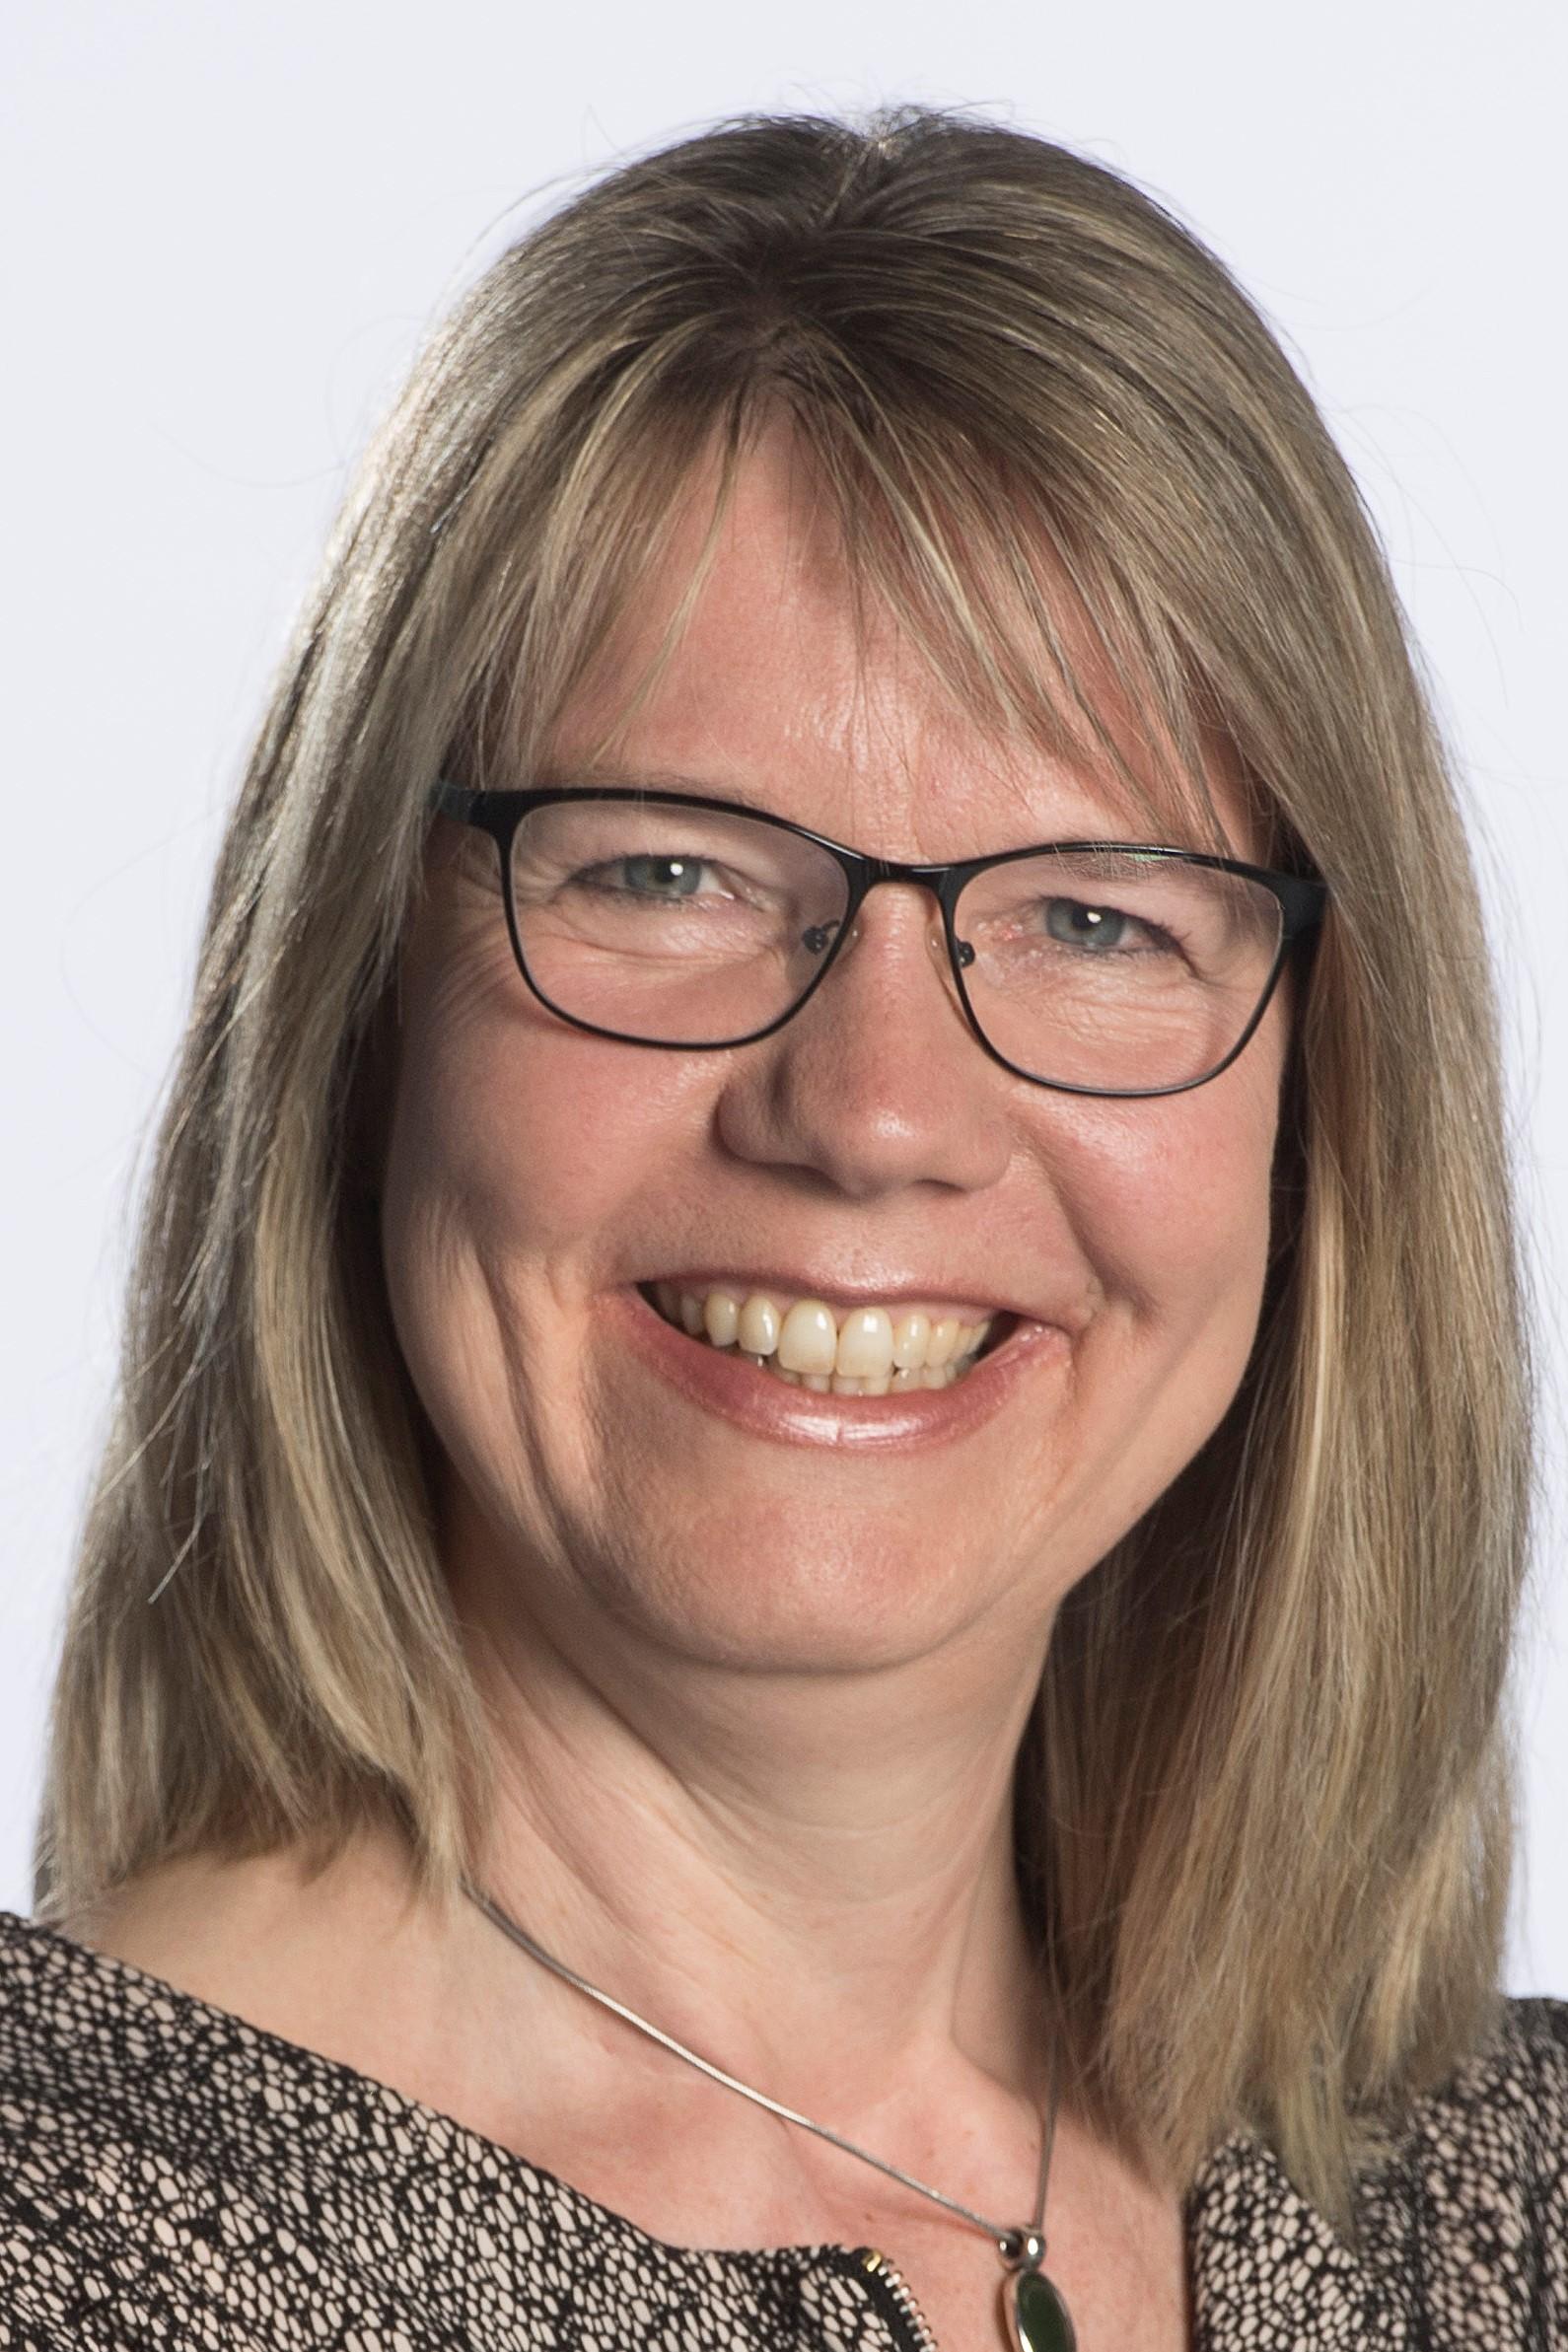 Karin Ooiman